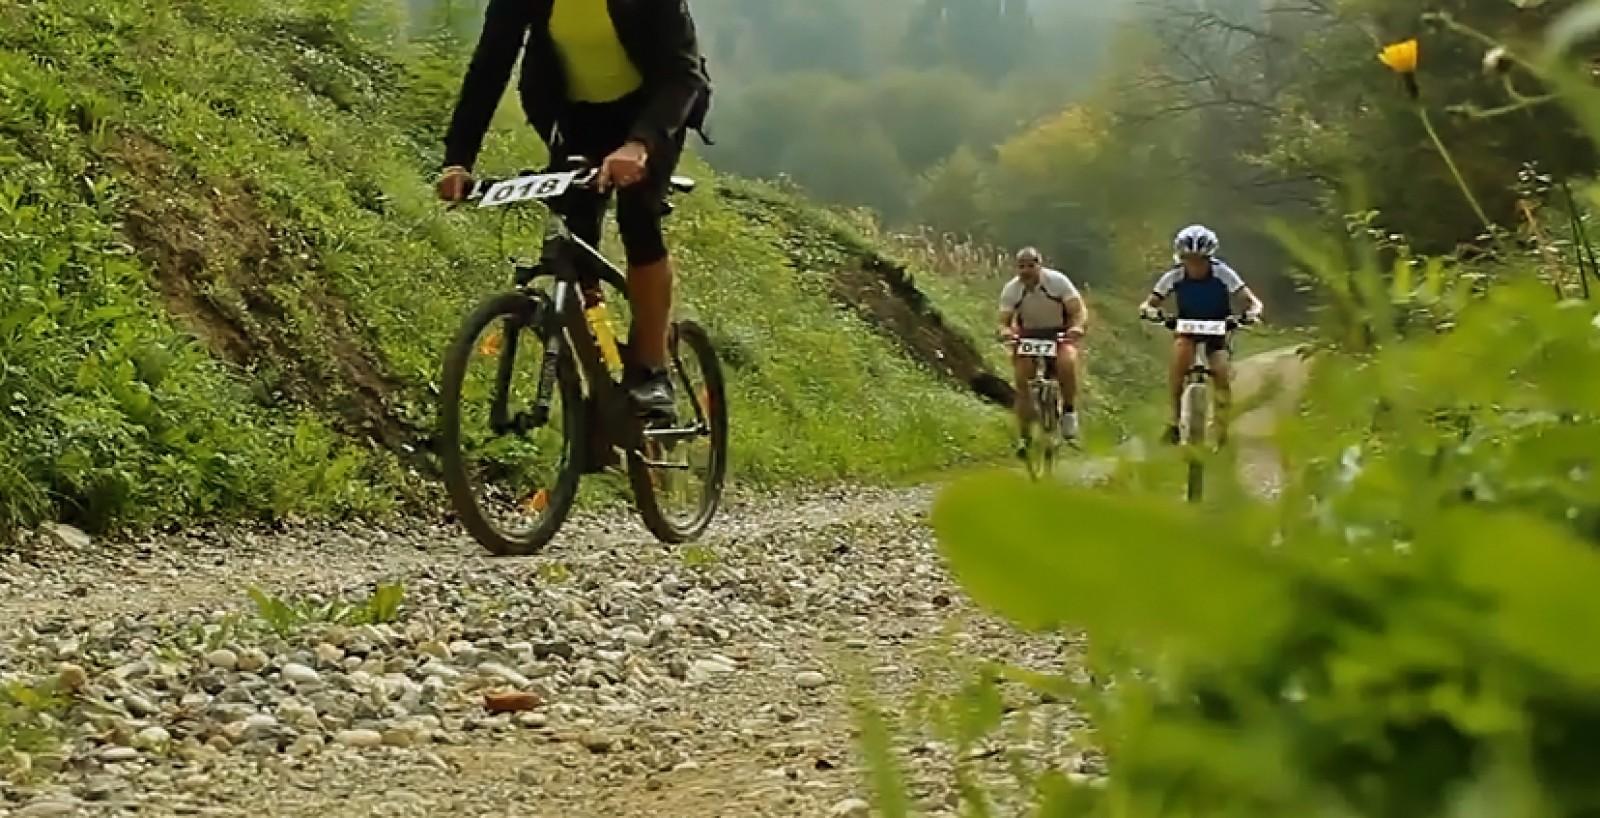 Vožnja bicikla utiče na fizičku spremnost i na psihičku stabilnost